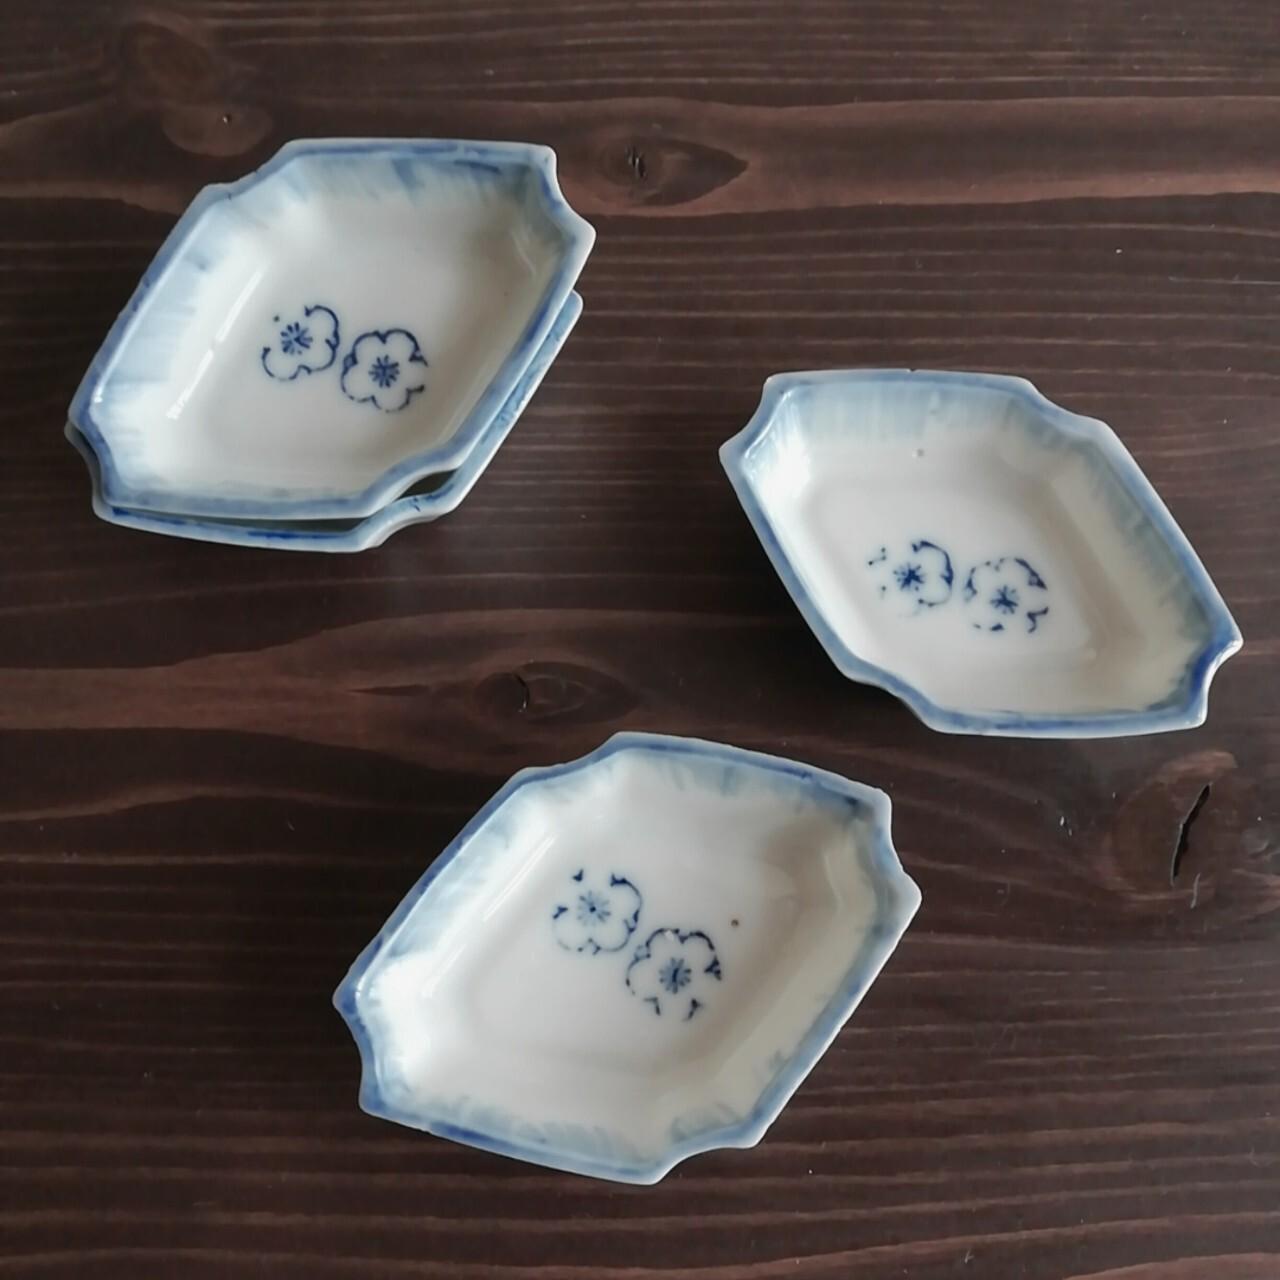 梅文菱形豆皿 2枚セット【昭和中期頃】